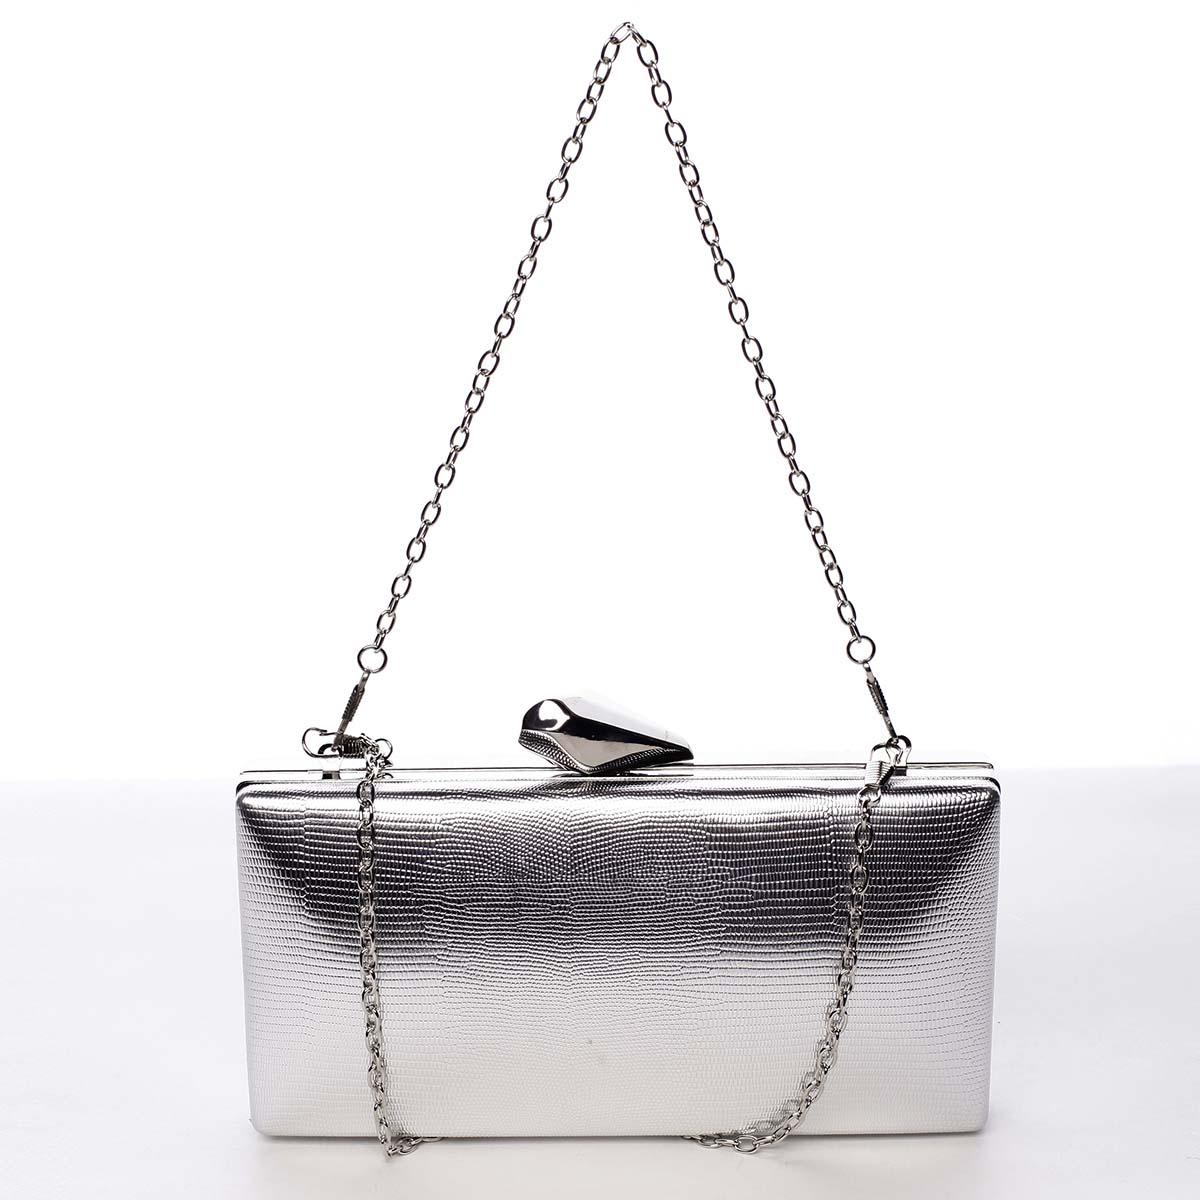 Elegantní matné dámské psaníčko stříbrné - Michelle Moon Elegance